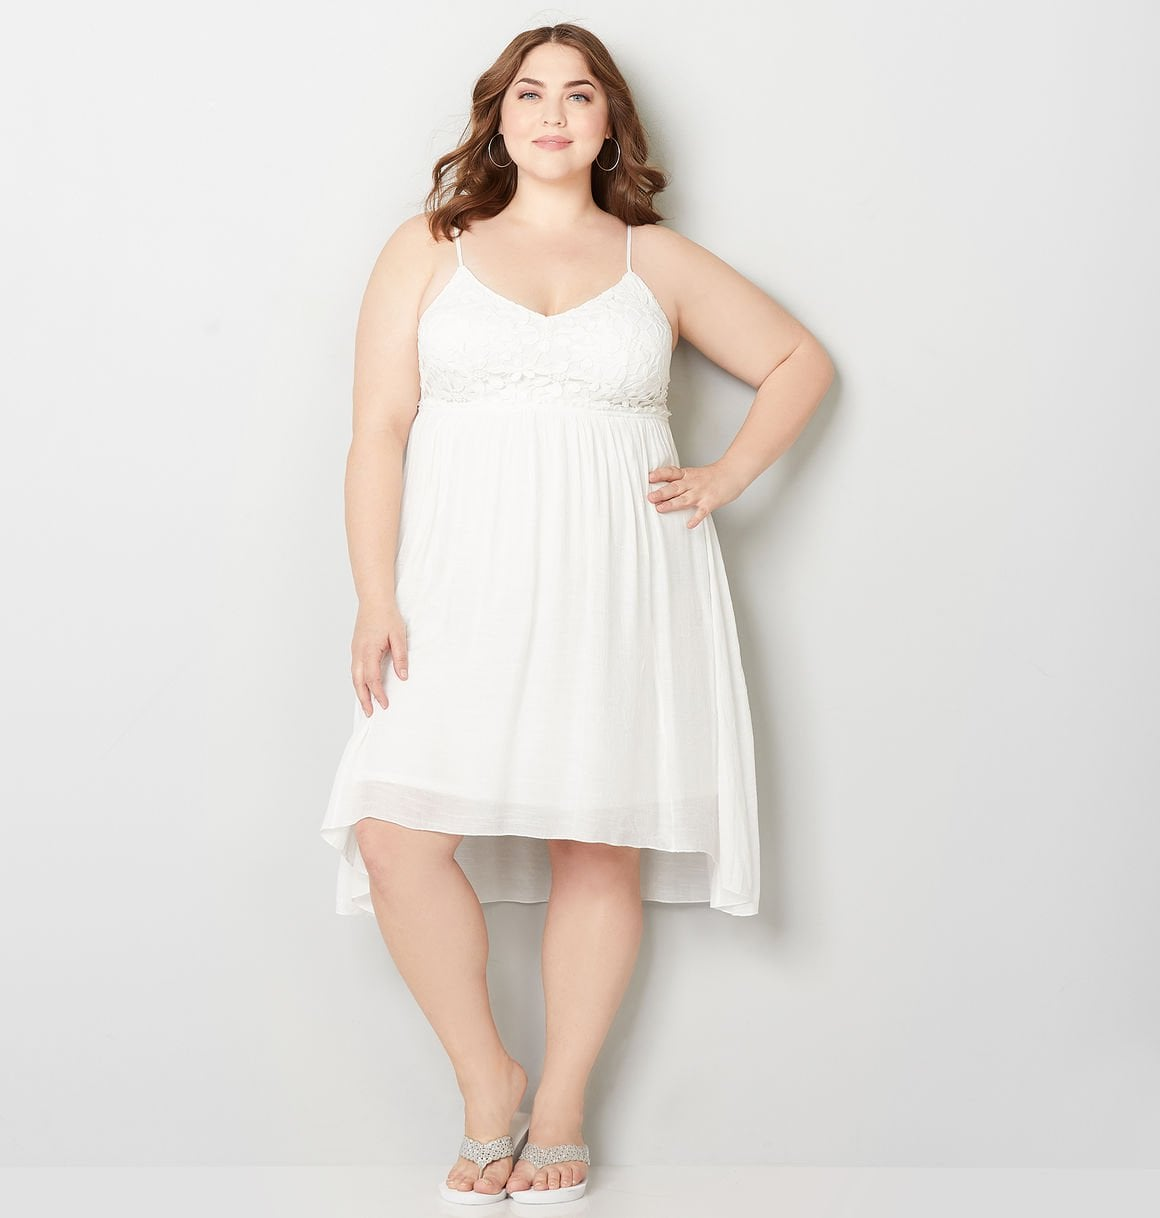 Avenue Plus Size Dress | Hailey Baldwin Looks Like an Actual ...